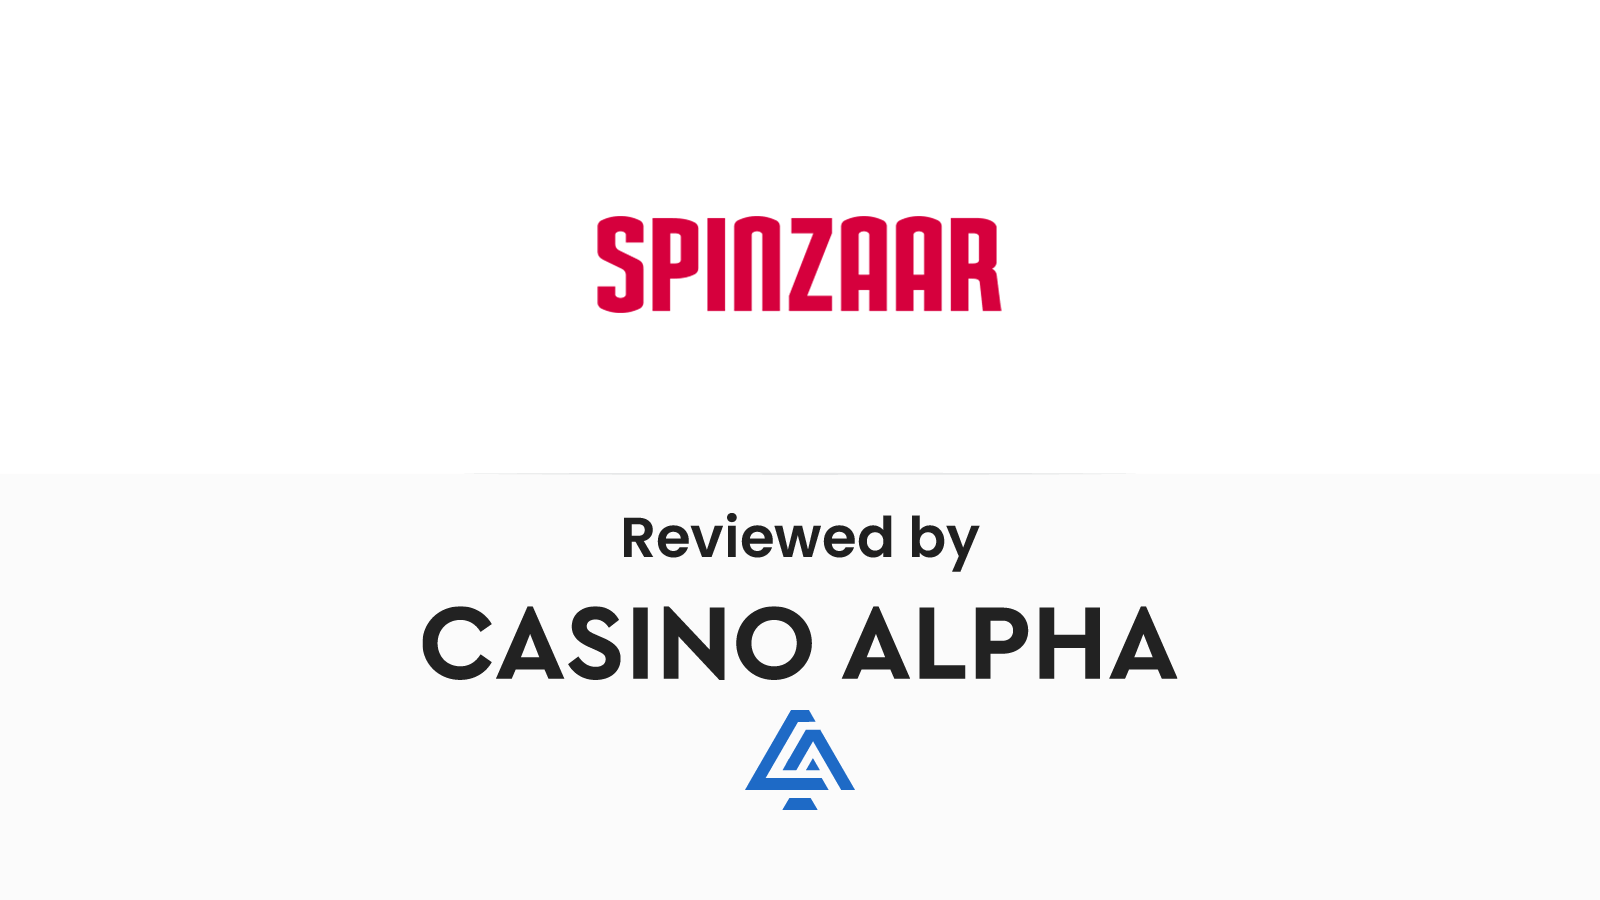 Spinzaar Review & Promotions List